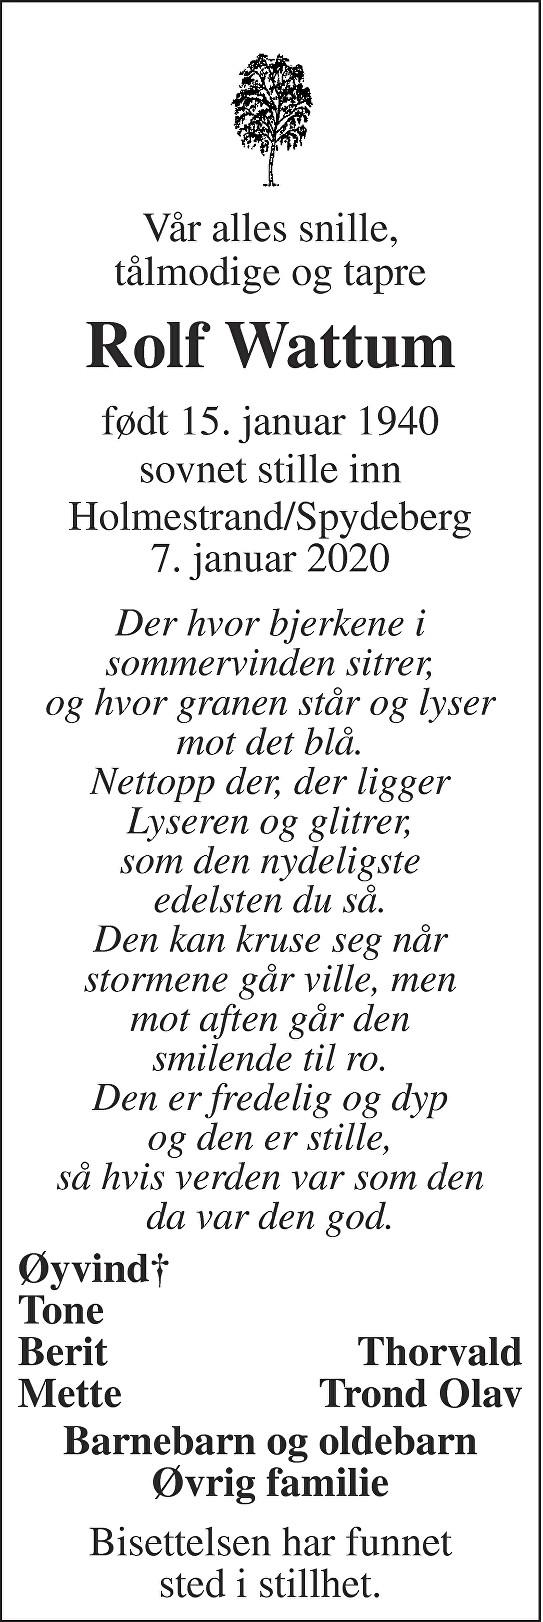 Rolf Wattum Dødsannonse